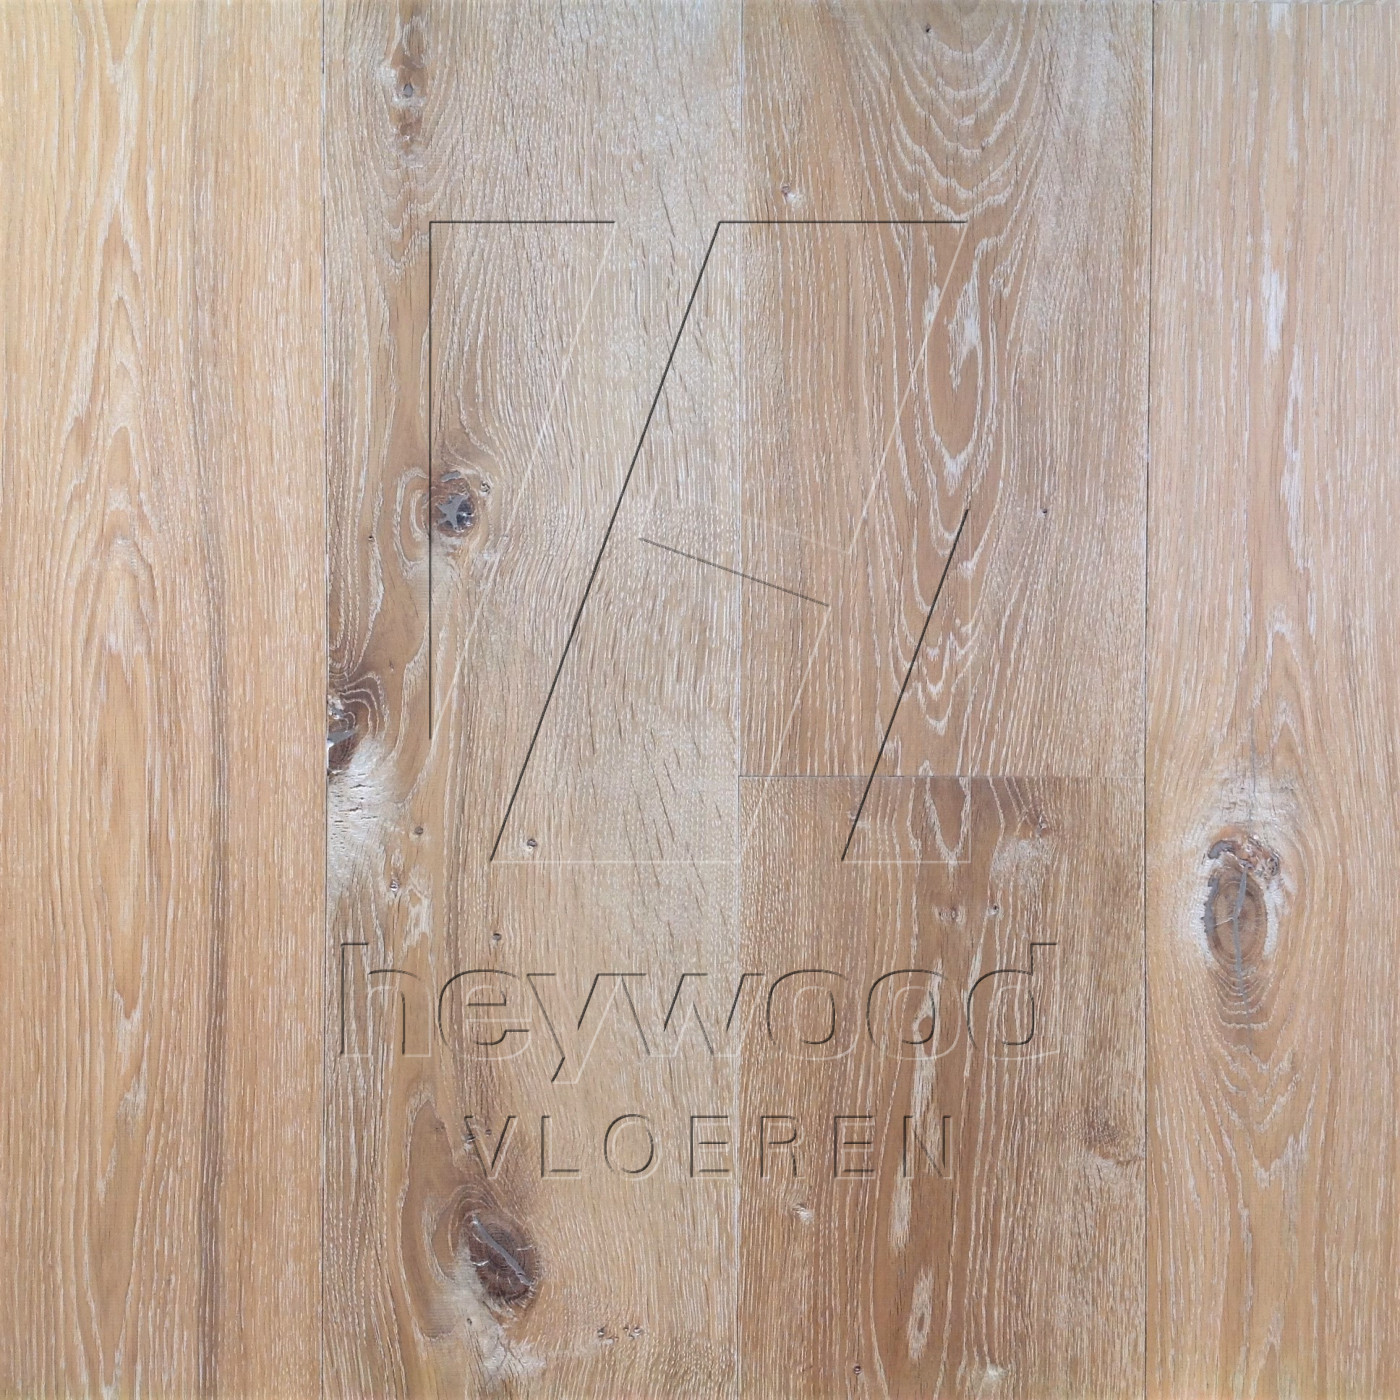 CPO#20  Calgary in European Oak Character of Bespoke Wooden Floors